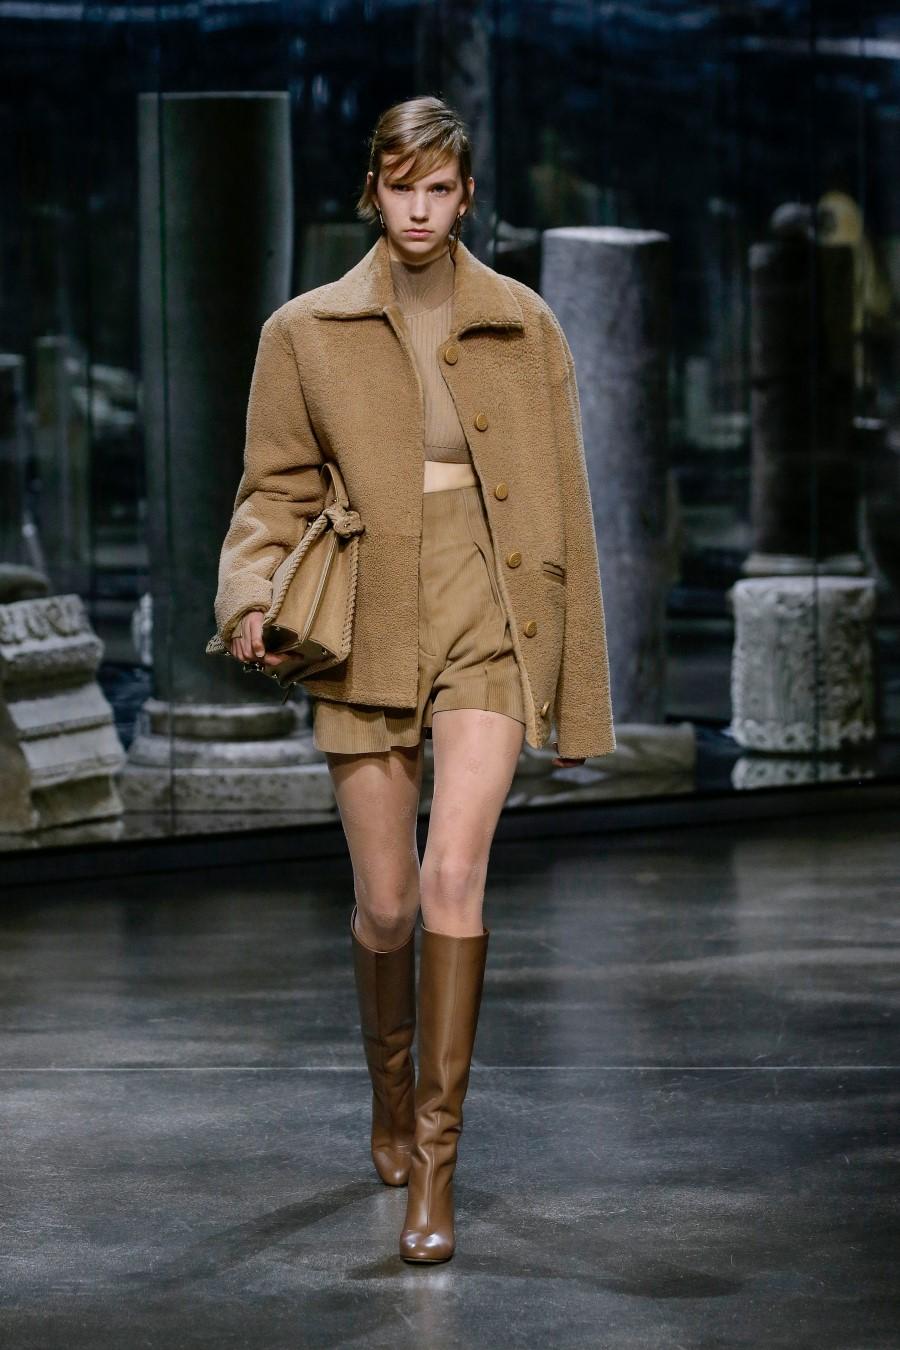 Fendi Fall Winter 2021 - Milan Fashion Week